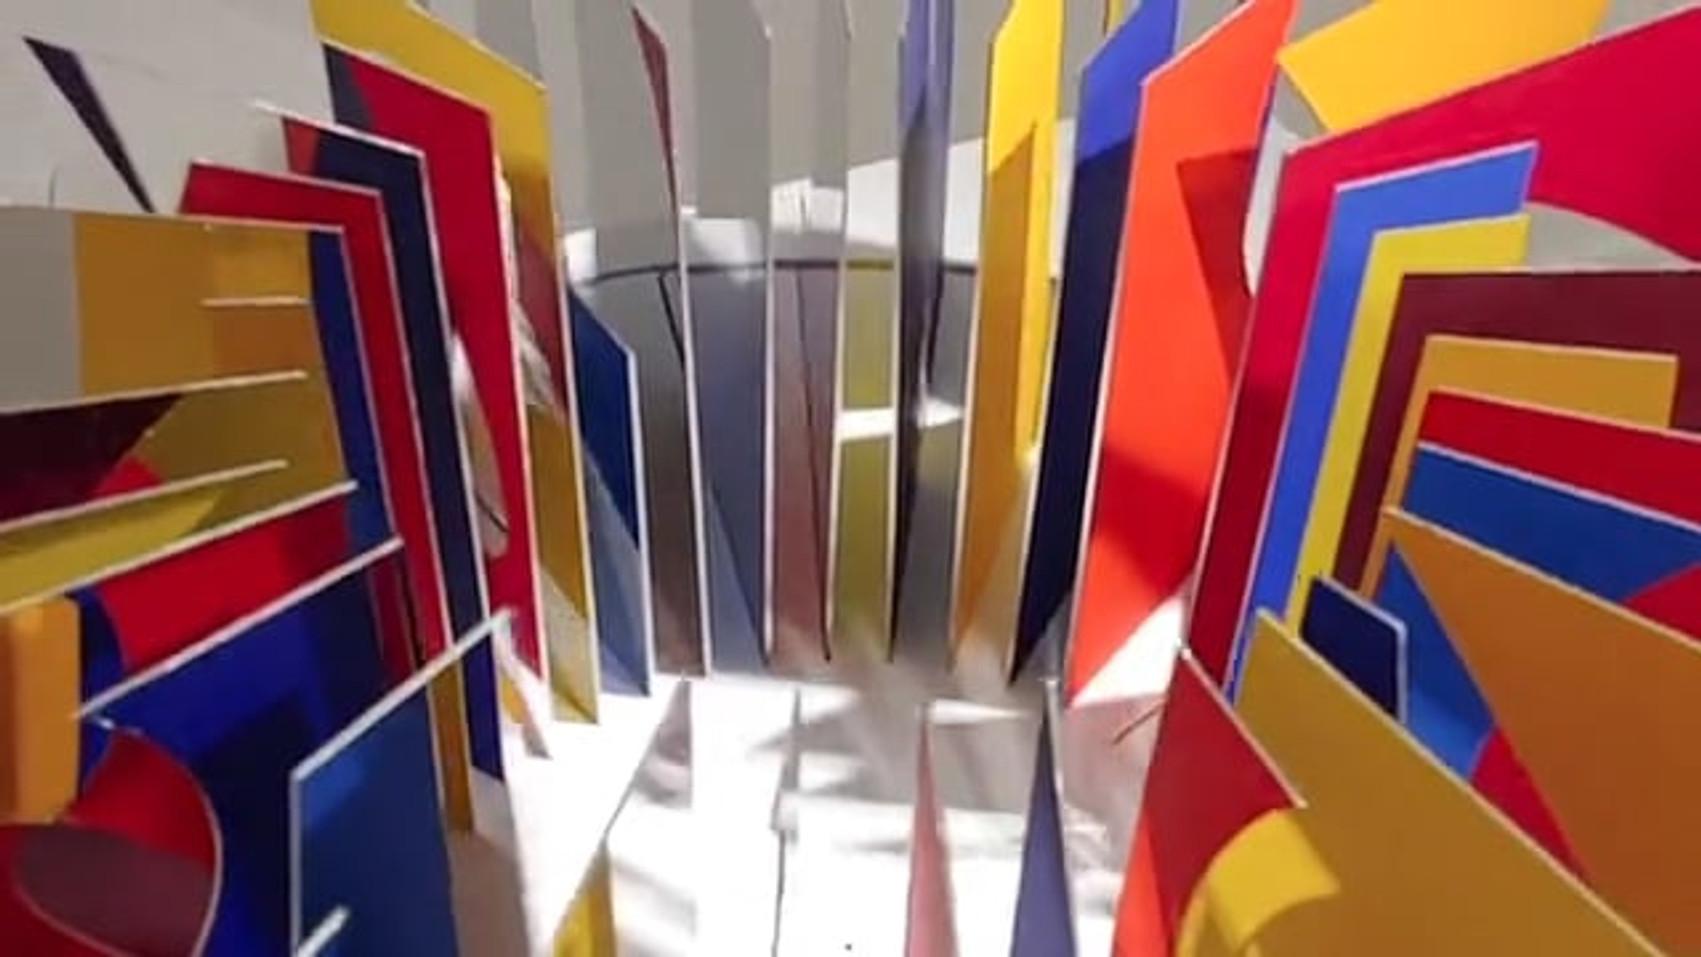 Philippe Leblanc : Geometric & Kinetic